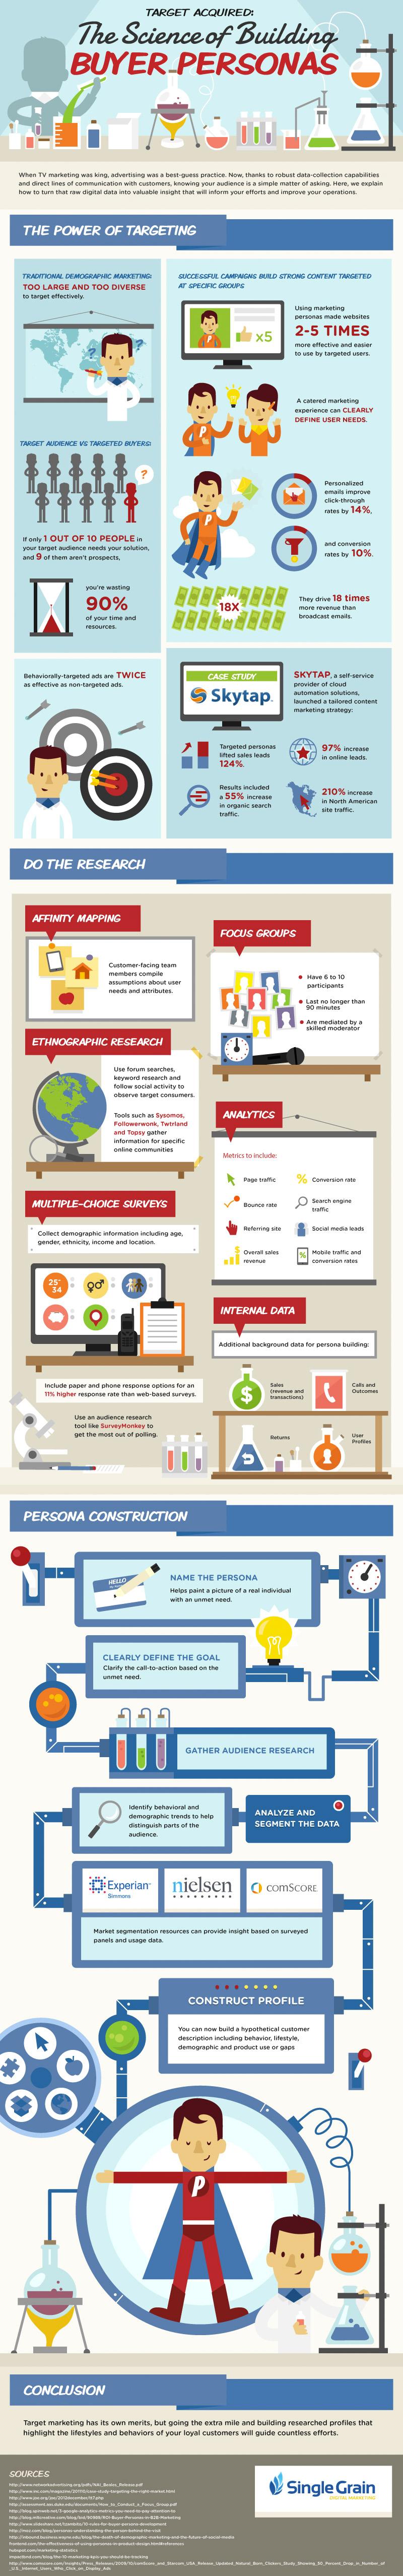 The Science Of Building Buyer Personas [Infographic] image 1417473147 science building buyer personas infographic.jpg